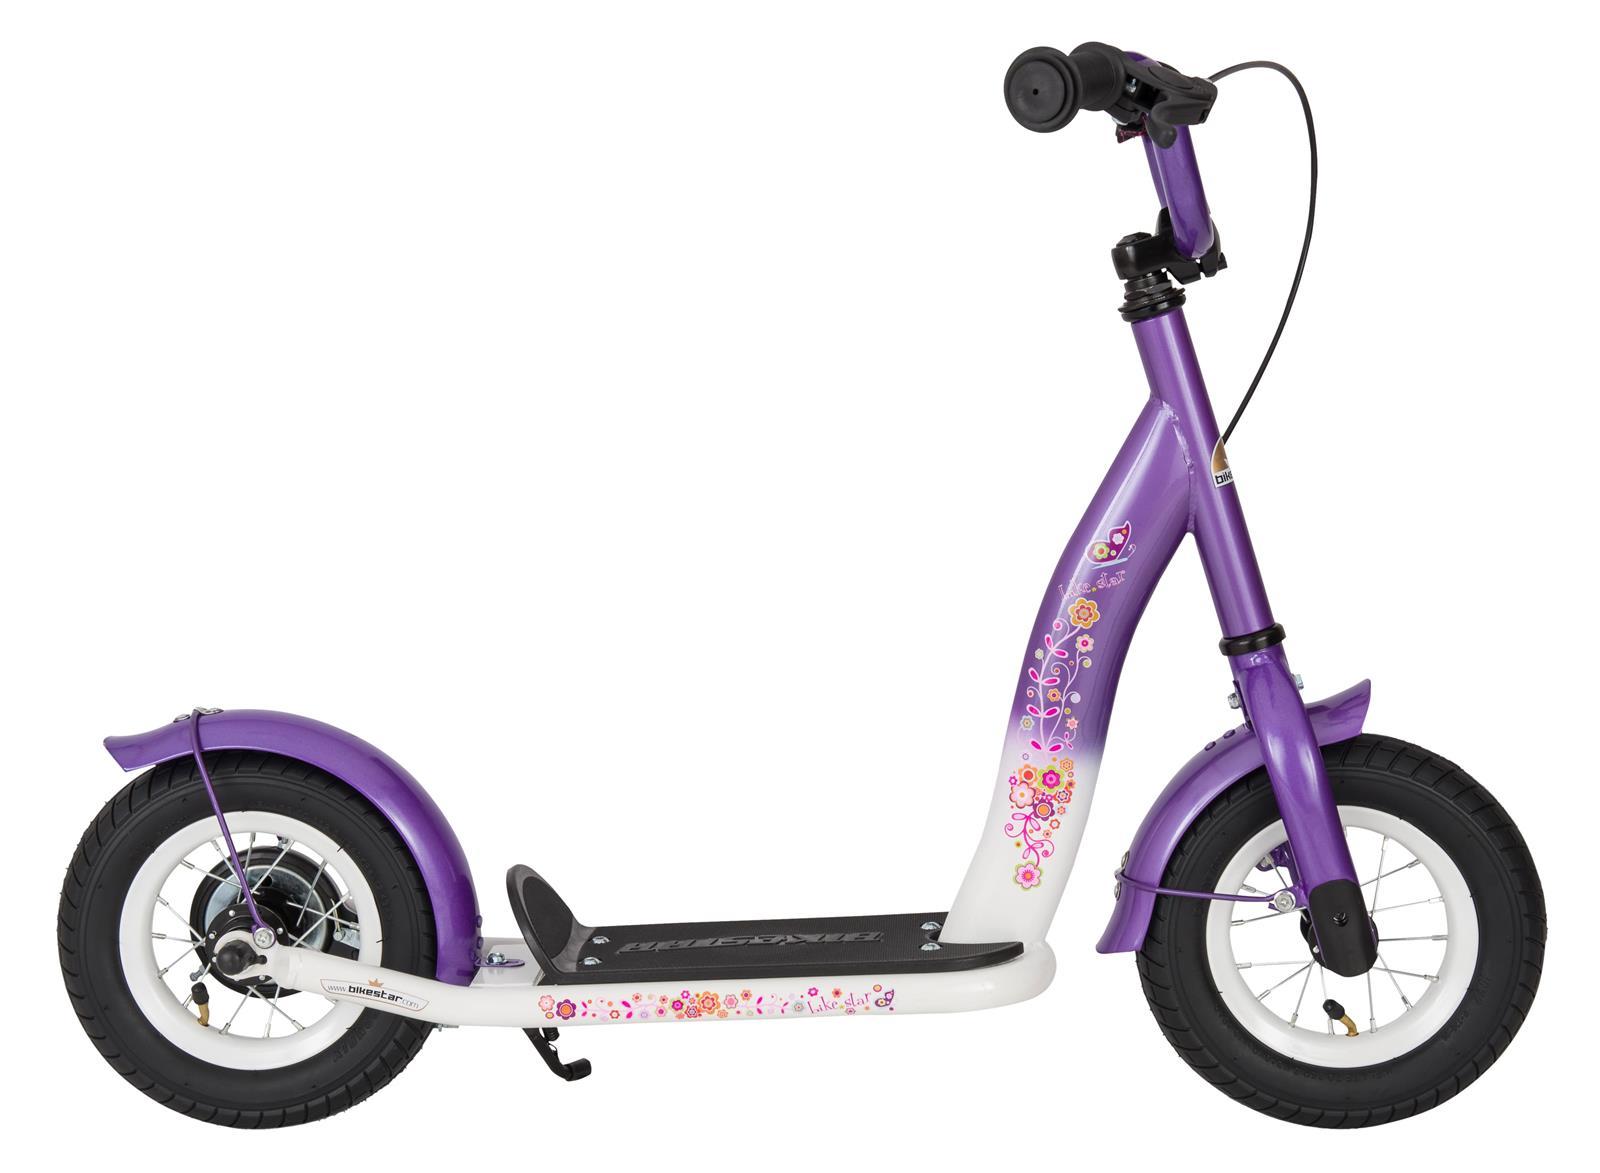 sc 10 kk 01 lcwe bikestar 10 zoll roller klassik lila wei. Black Bedroom Furniture Sets. Home Design Ideas